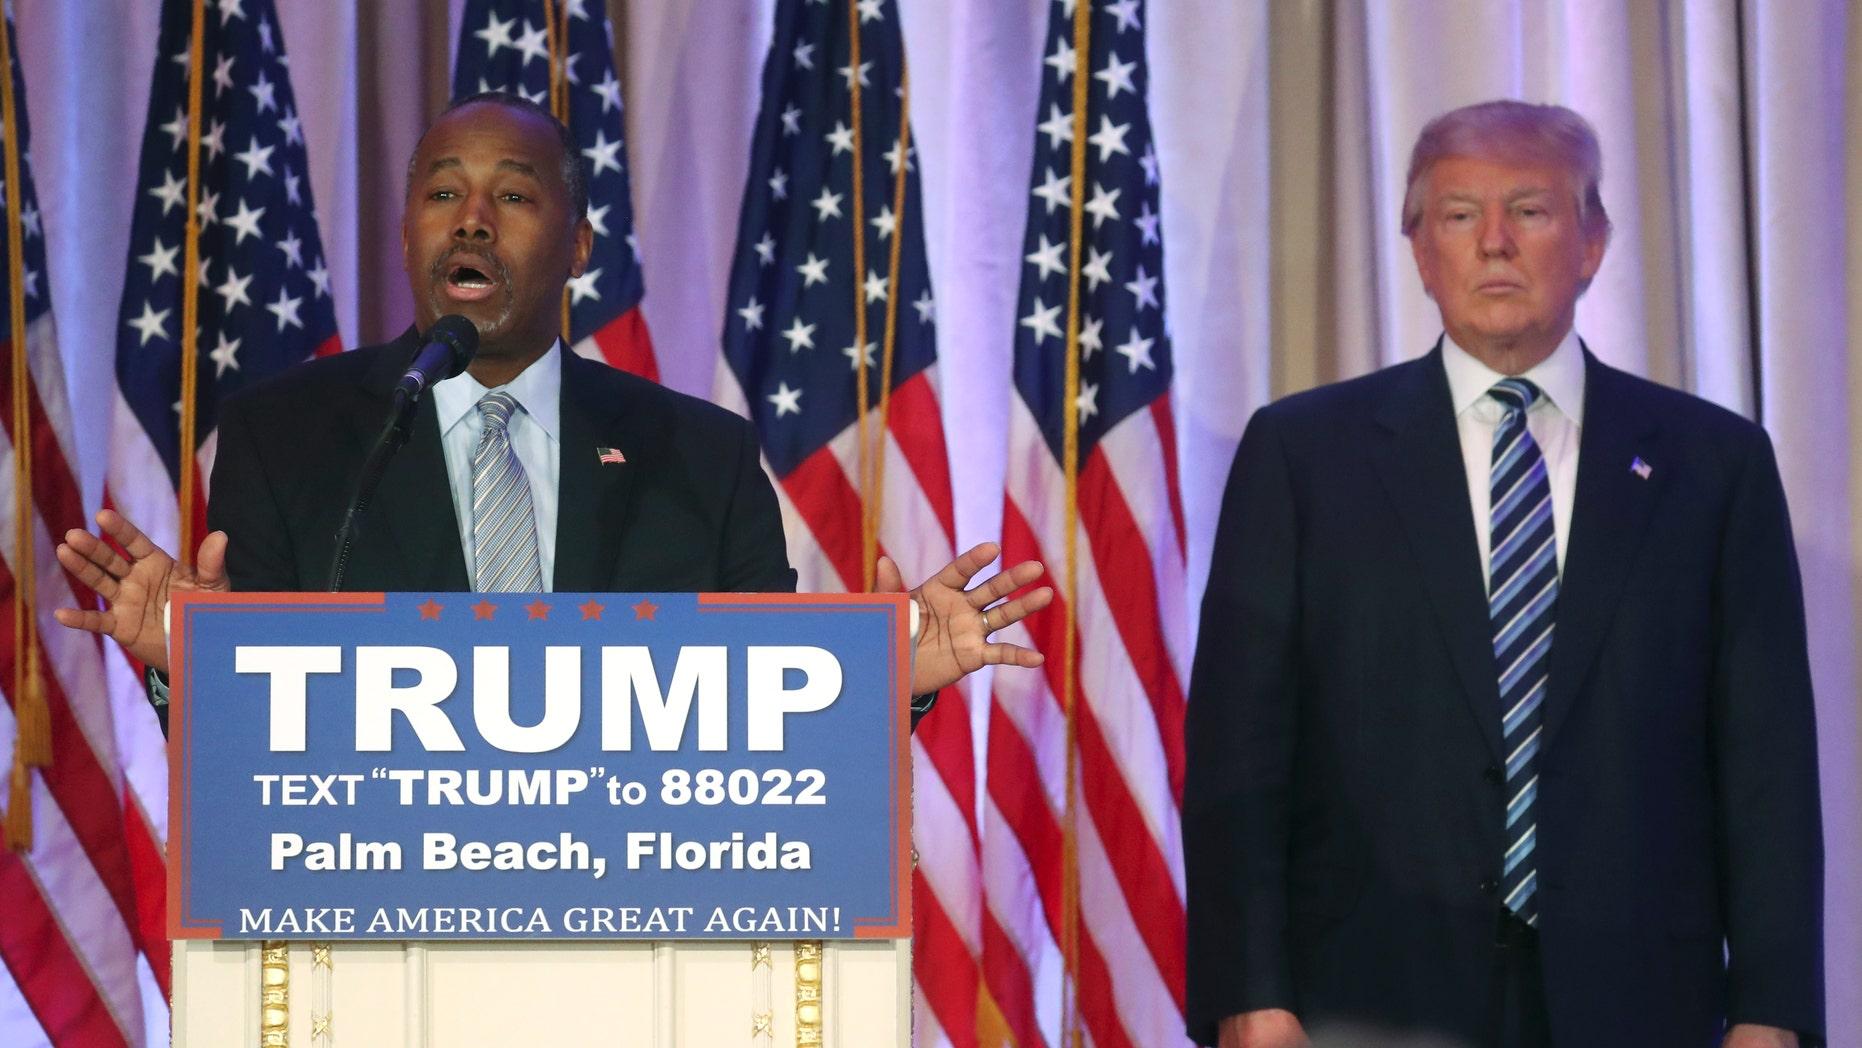 March 11, 2016: Former Republican U.S. presidential candidate Ben Carson endorses Donald Trump.